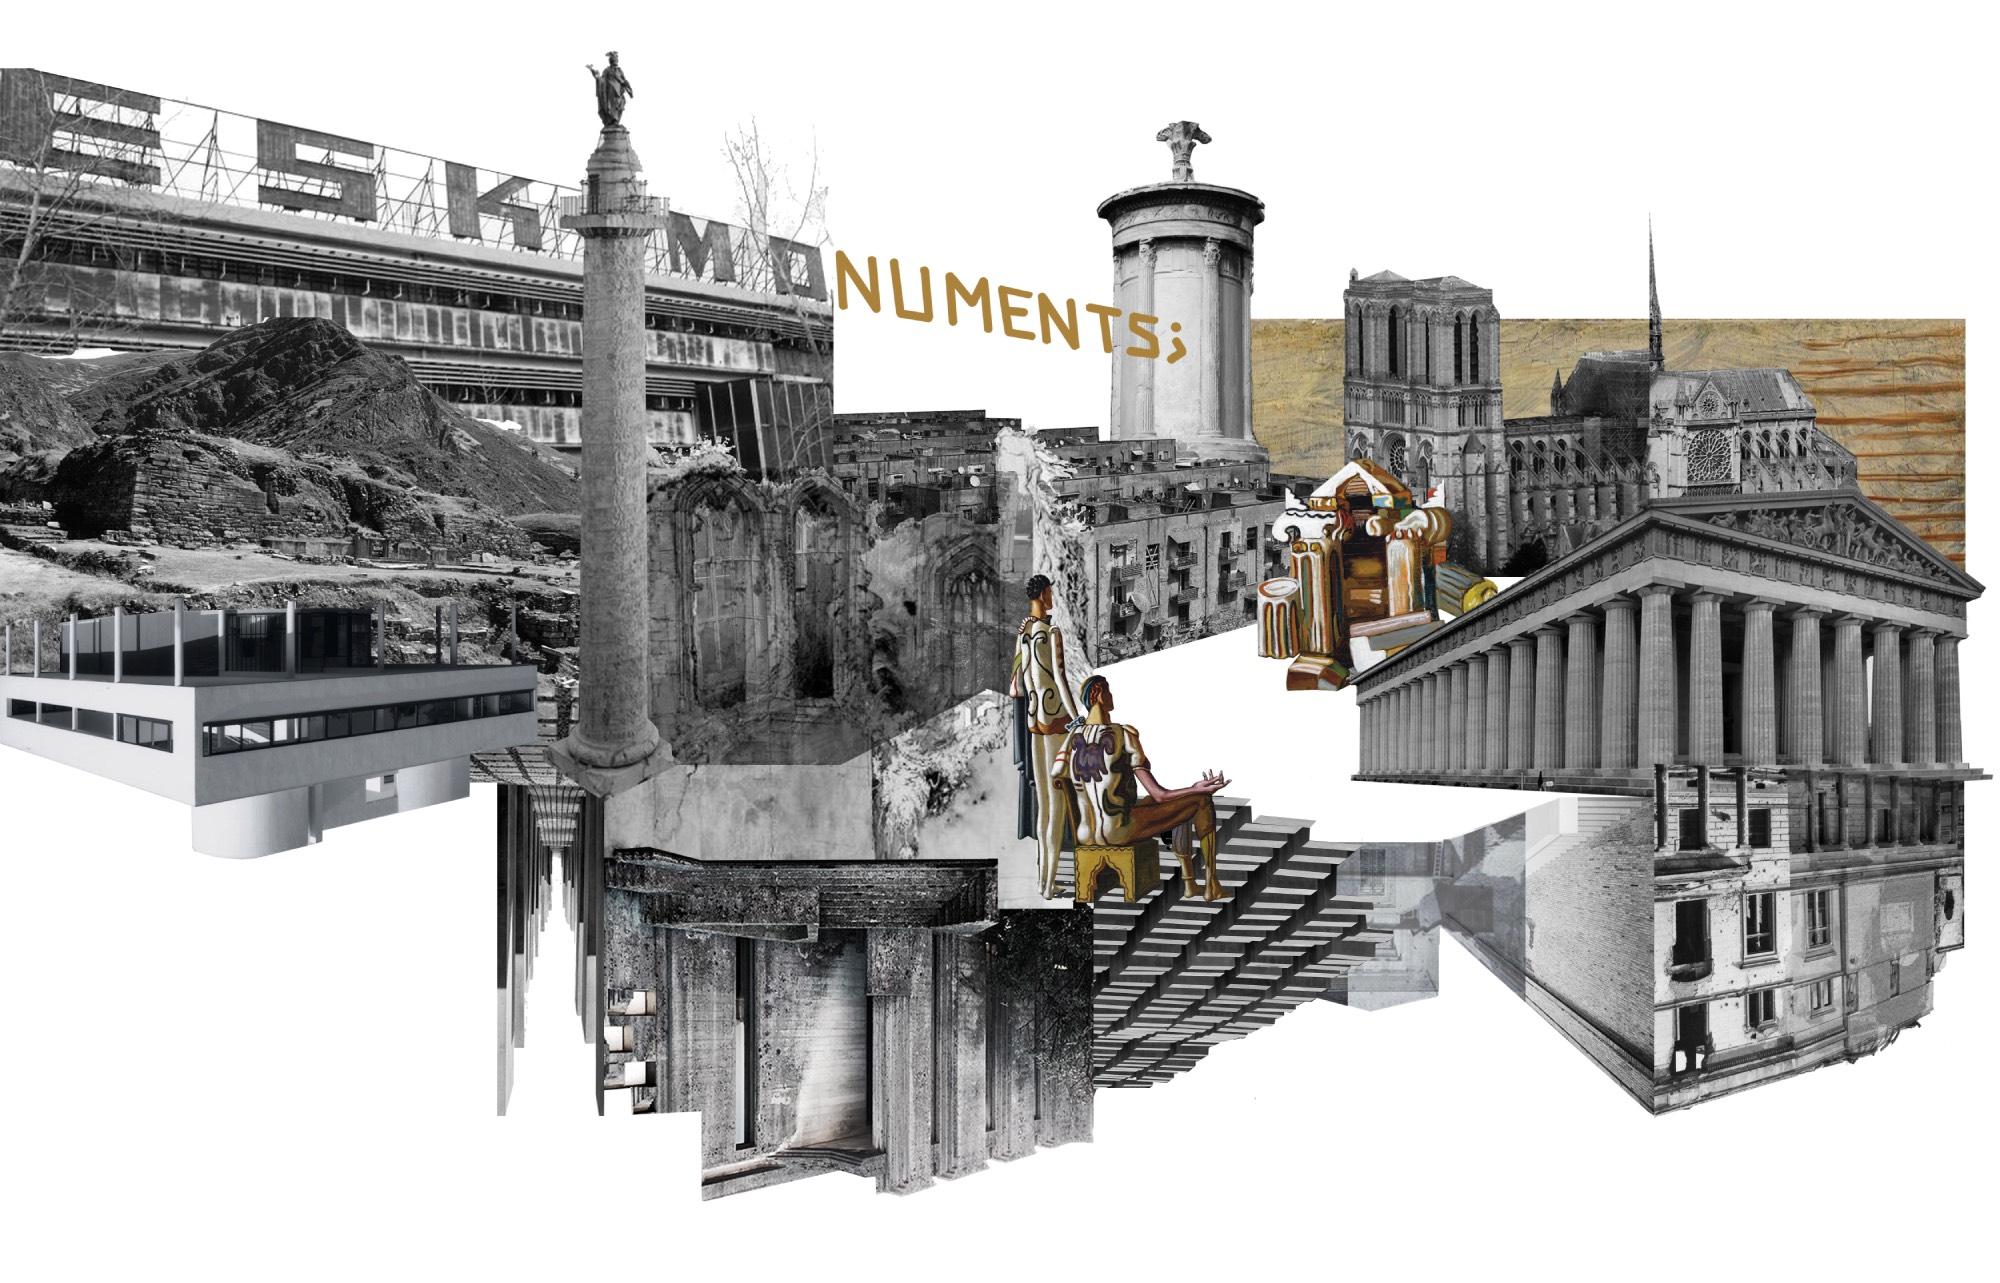 Alois Riegl, Χρόνος και Αρχιτεκτονική: Επαν-ερμηνεύοντας Μητρώα Αξιών